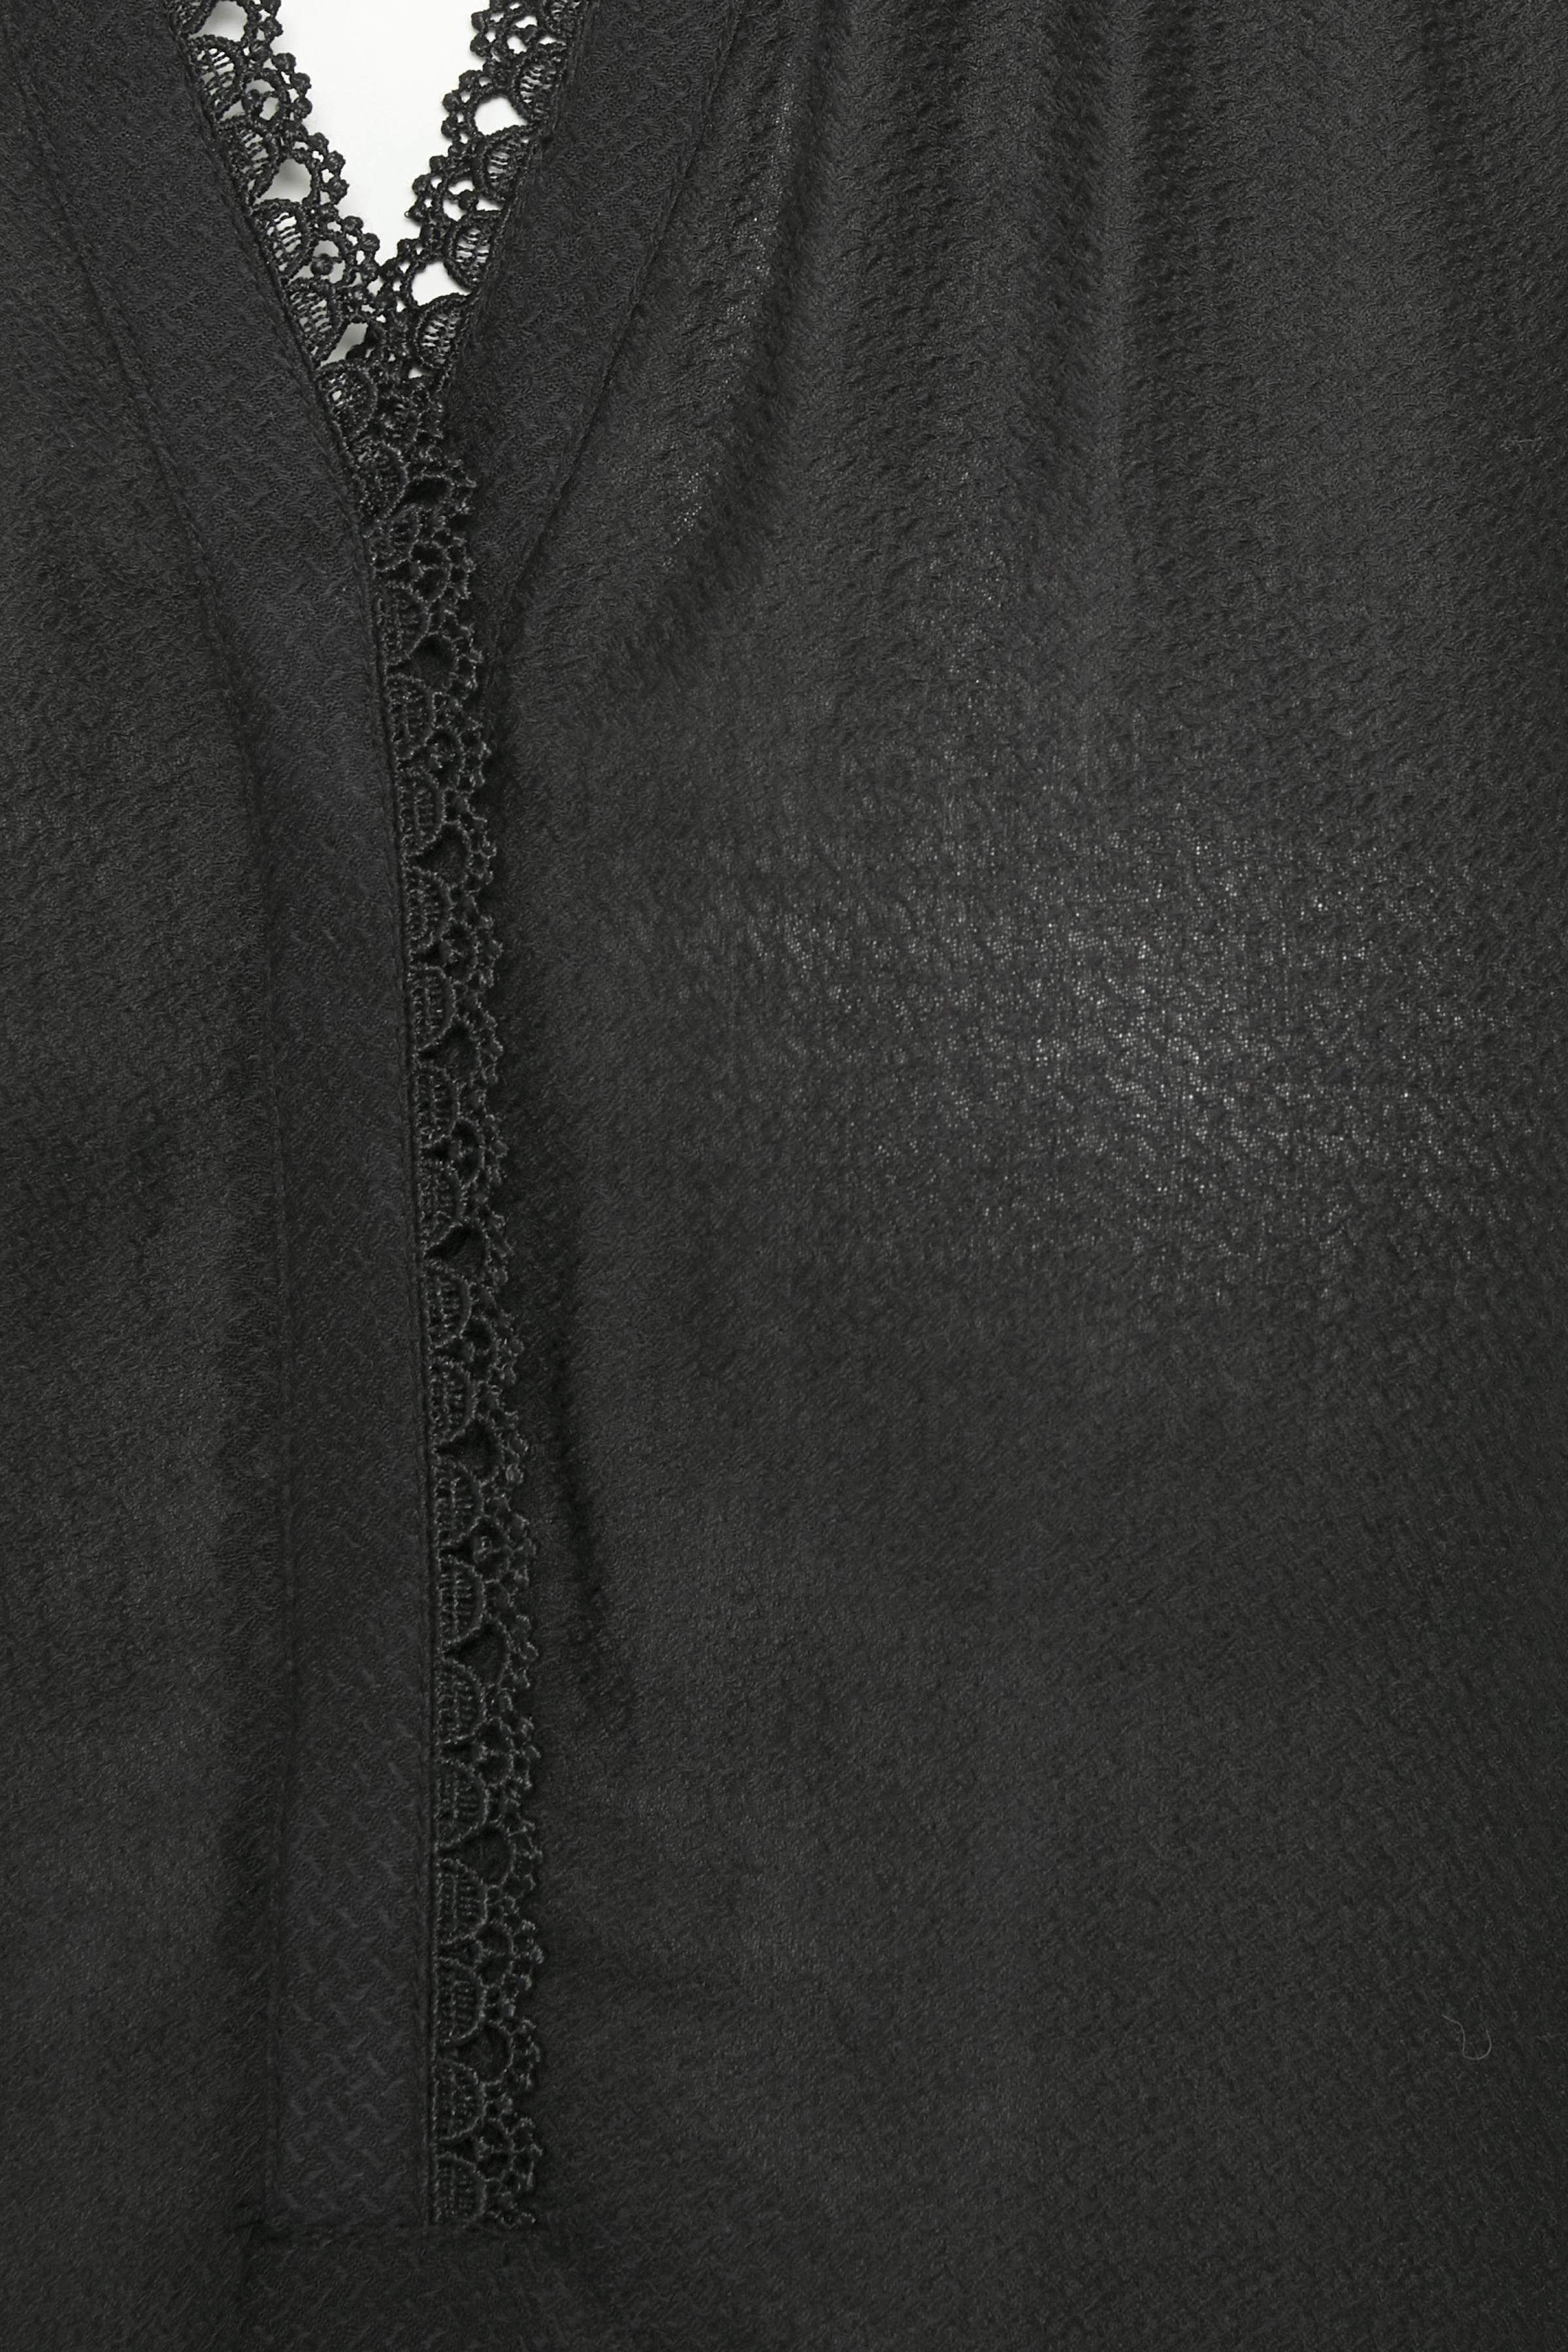 Svart Långärmad blus från Bon'A Parte – Köp Svart Långärmad blus från stl. S-2XL här